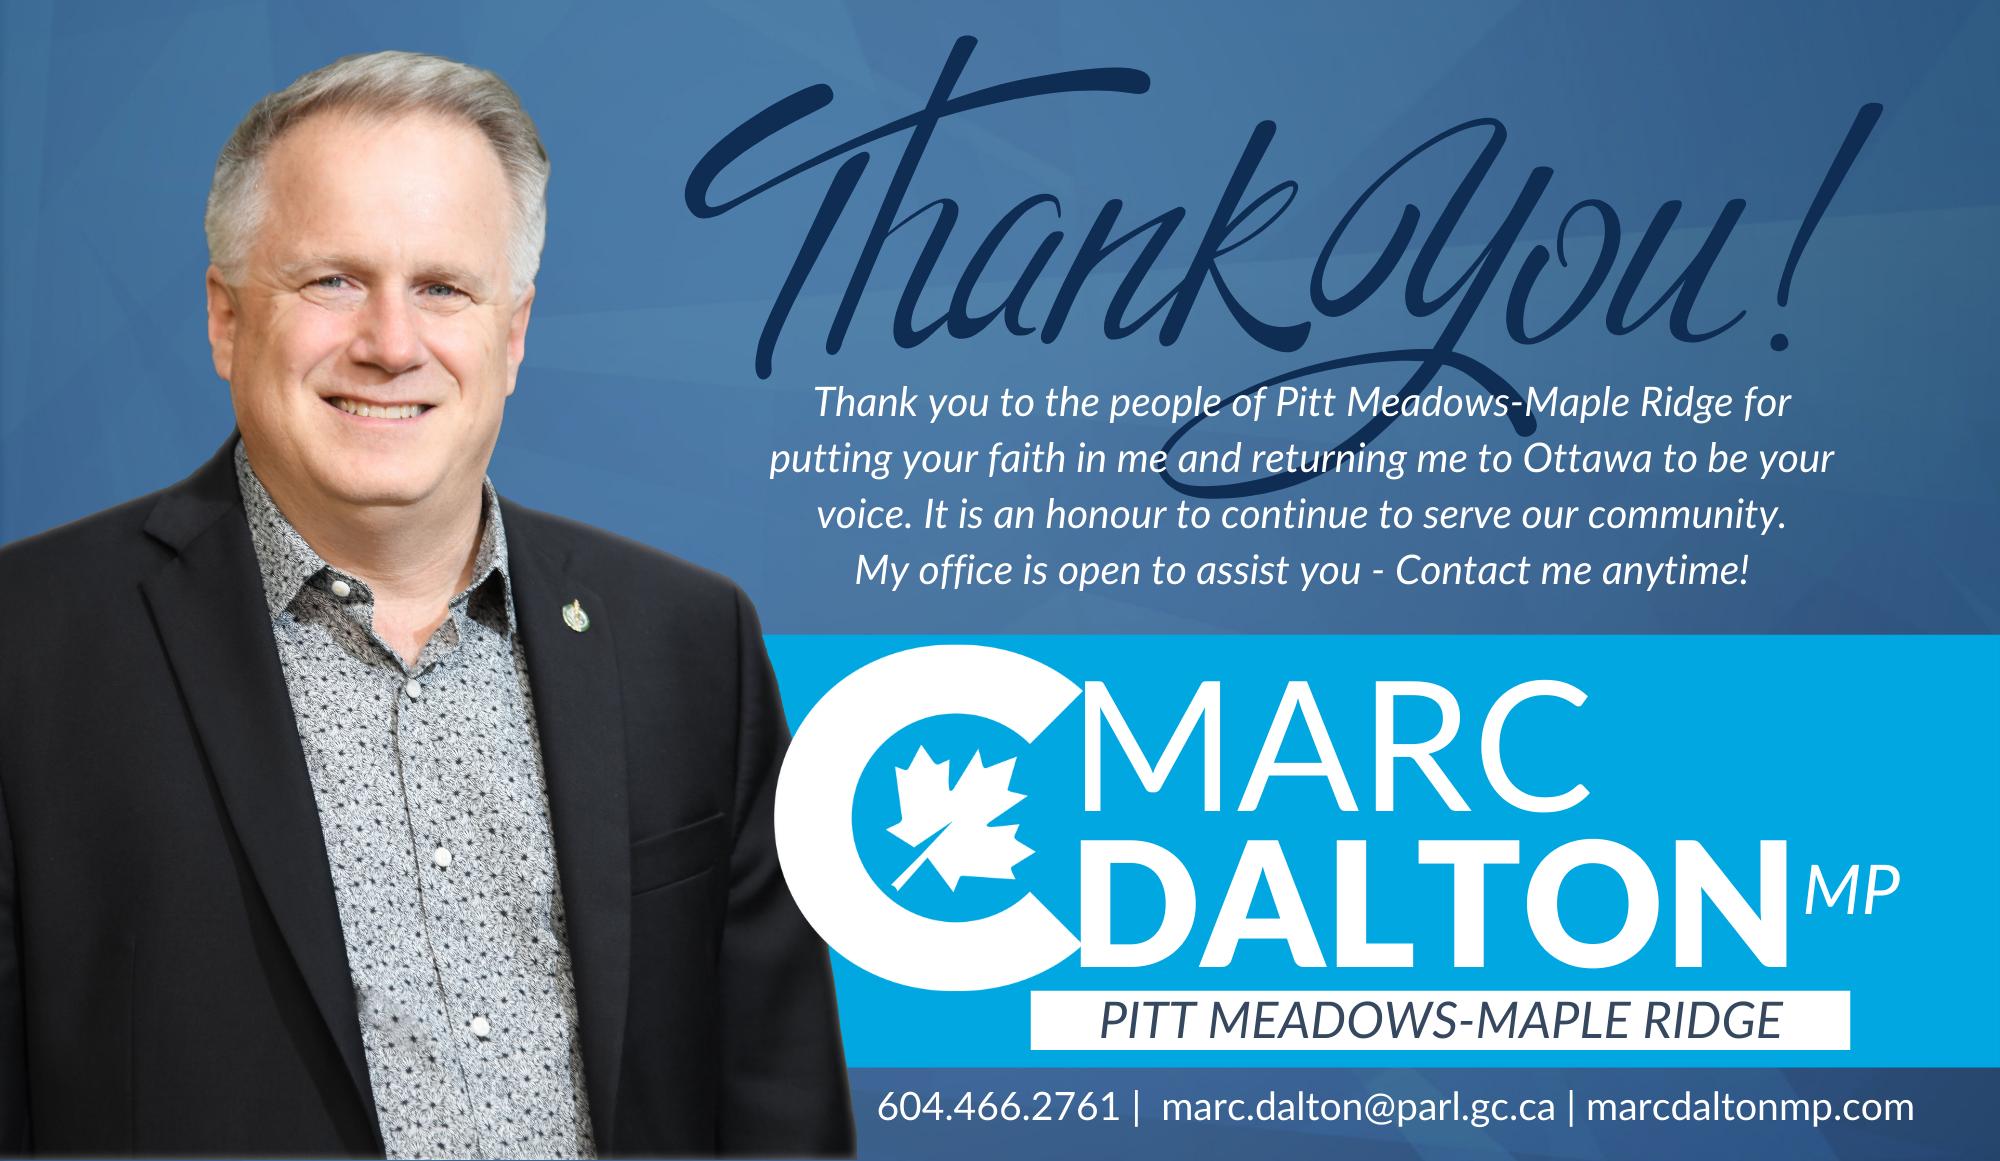 Thank you Pitt Meadows-Maple Ridge!